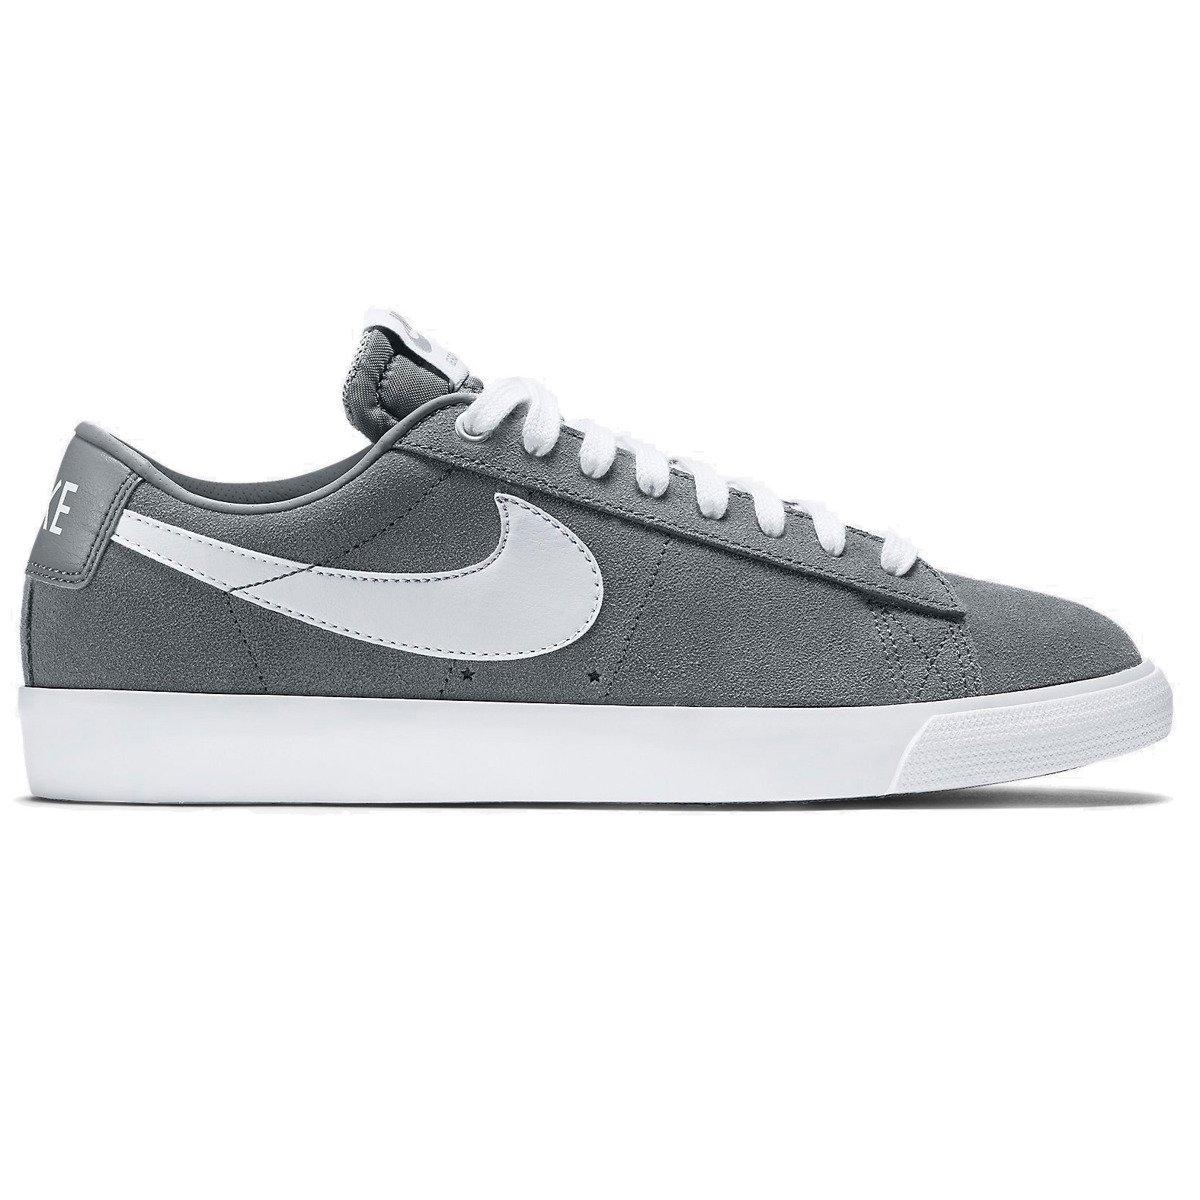 0ec395ff7fa Buty Nike SB Blazer Low GT COOL GREY WHITE-TIDE POOL BLUE grey ...